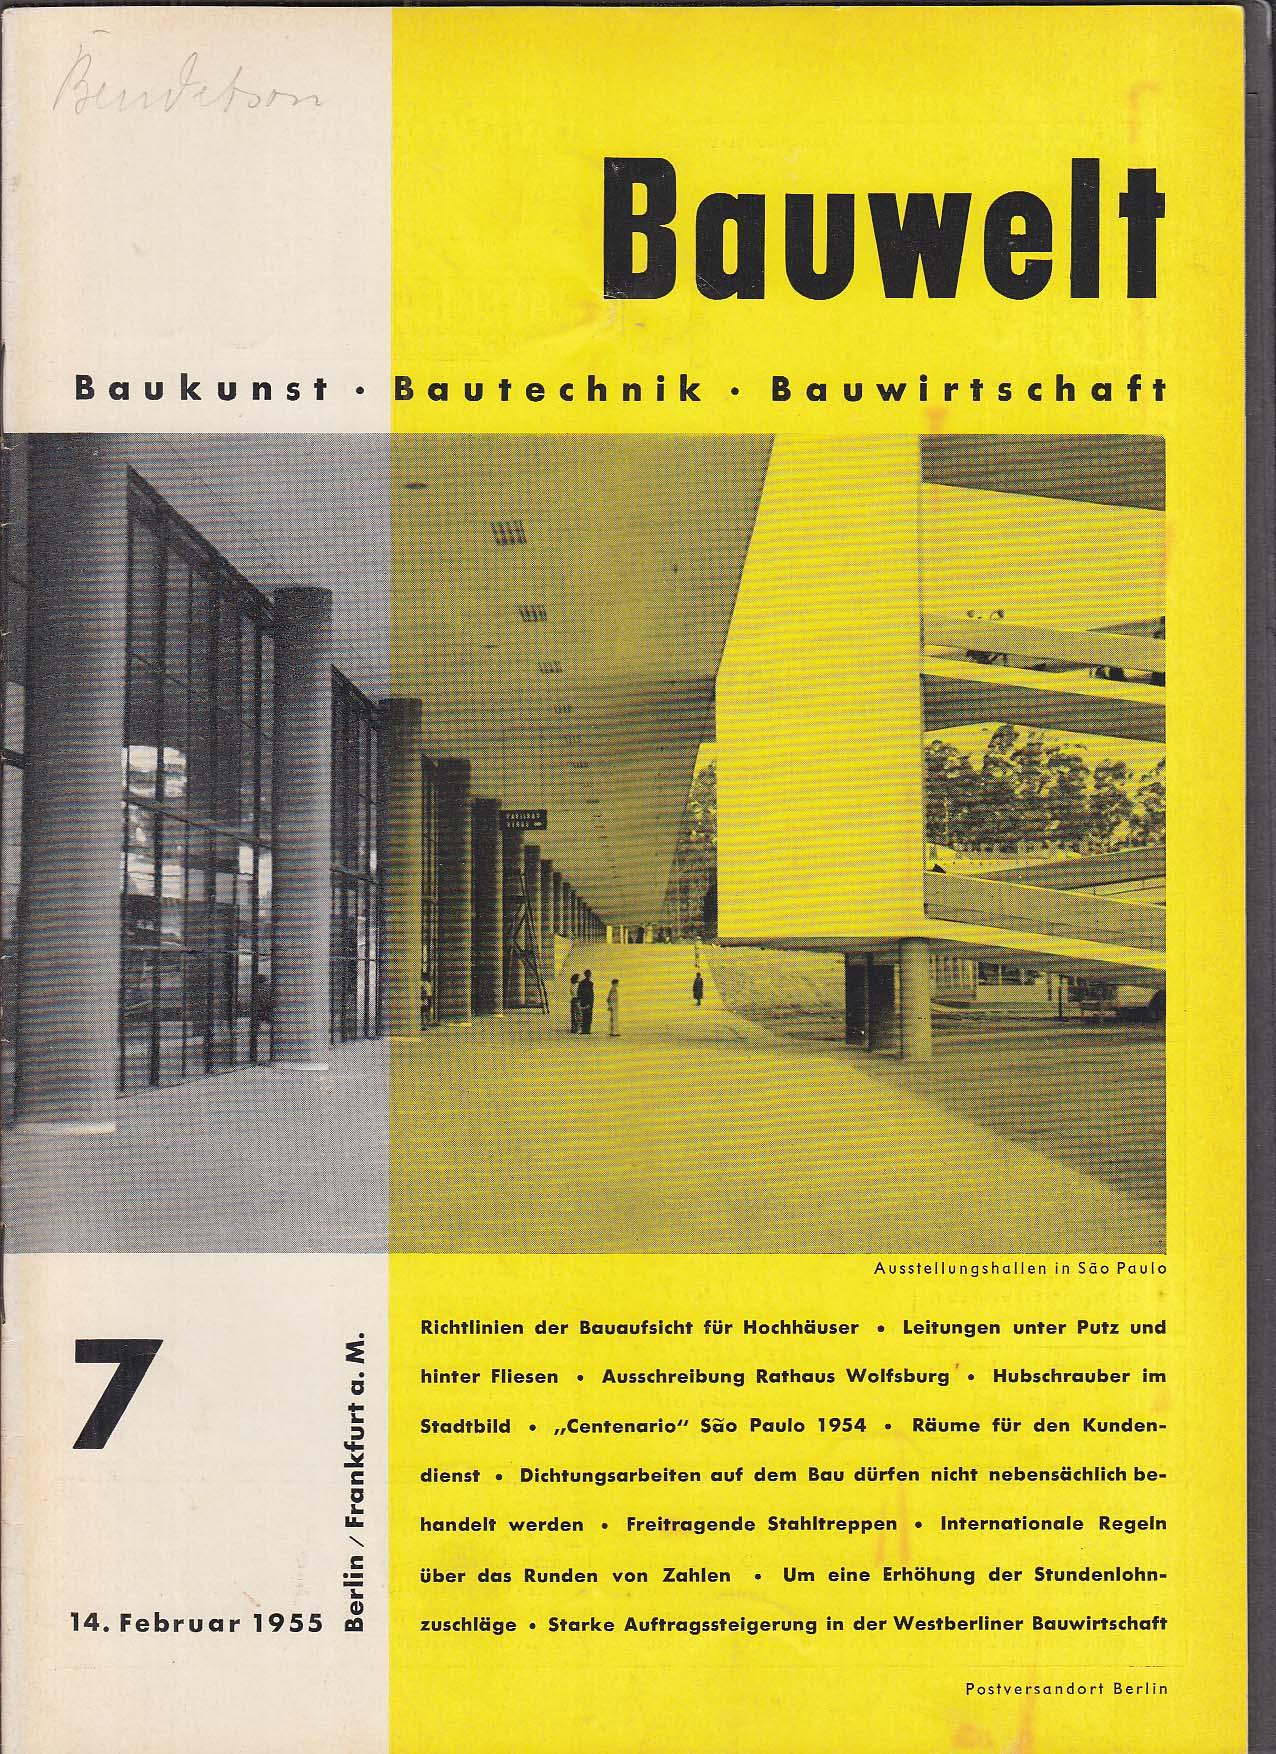 Bauwelt German architecture magazine 2/14/1955 7